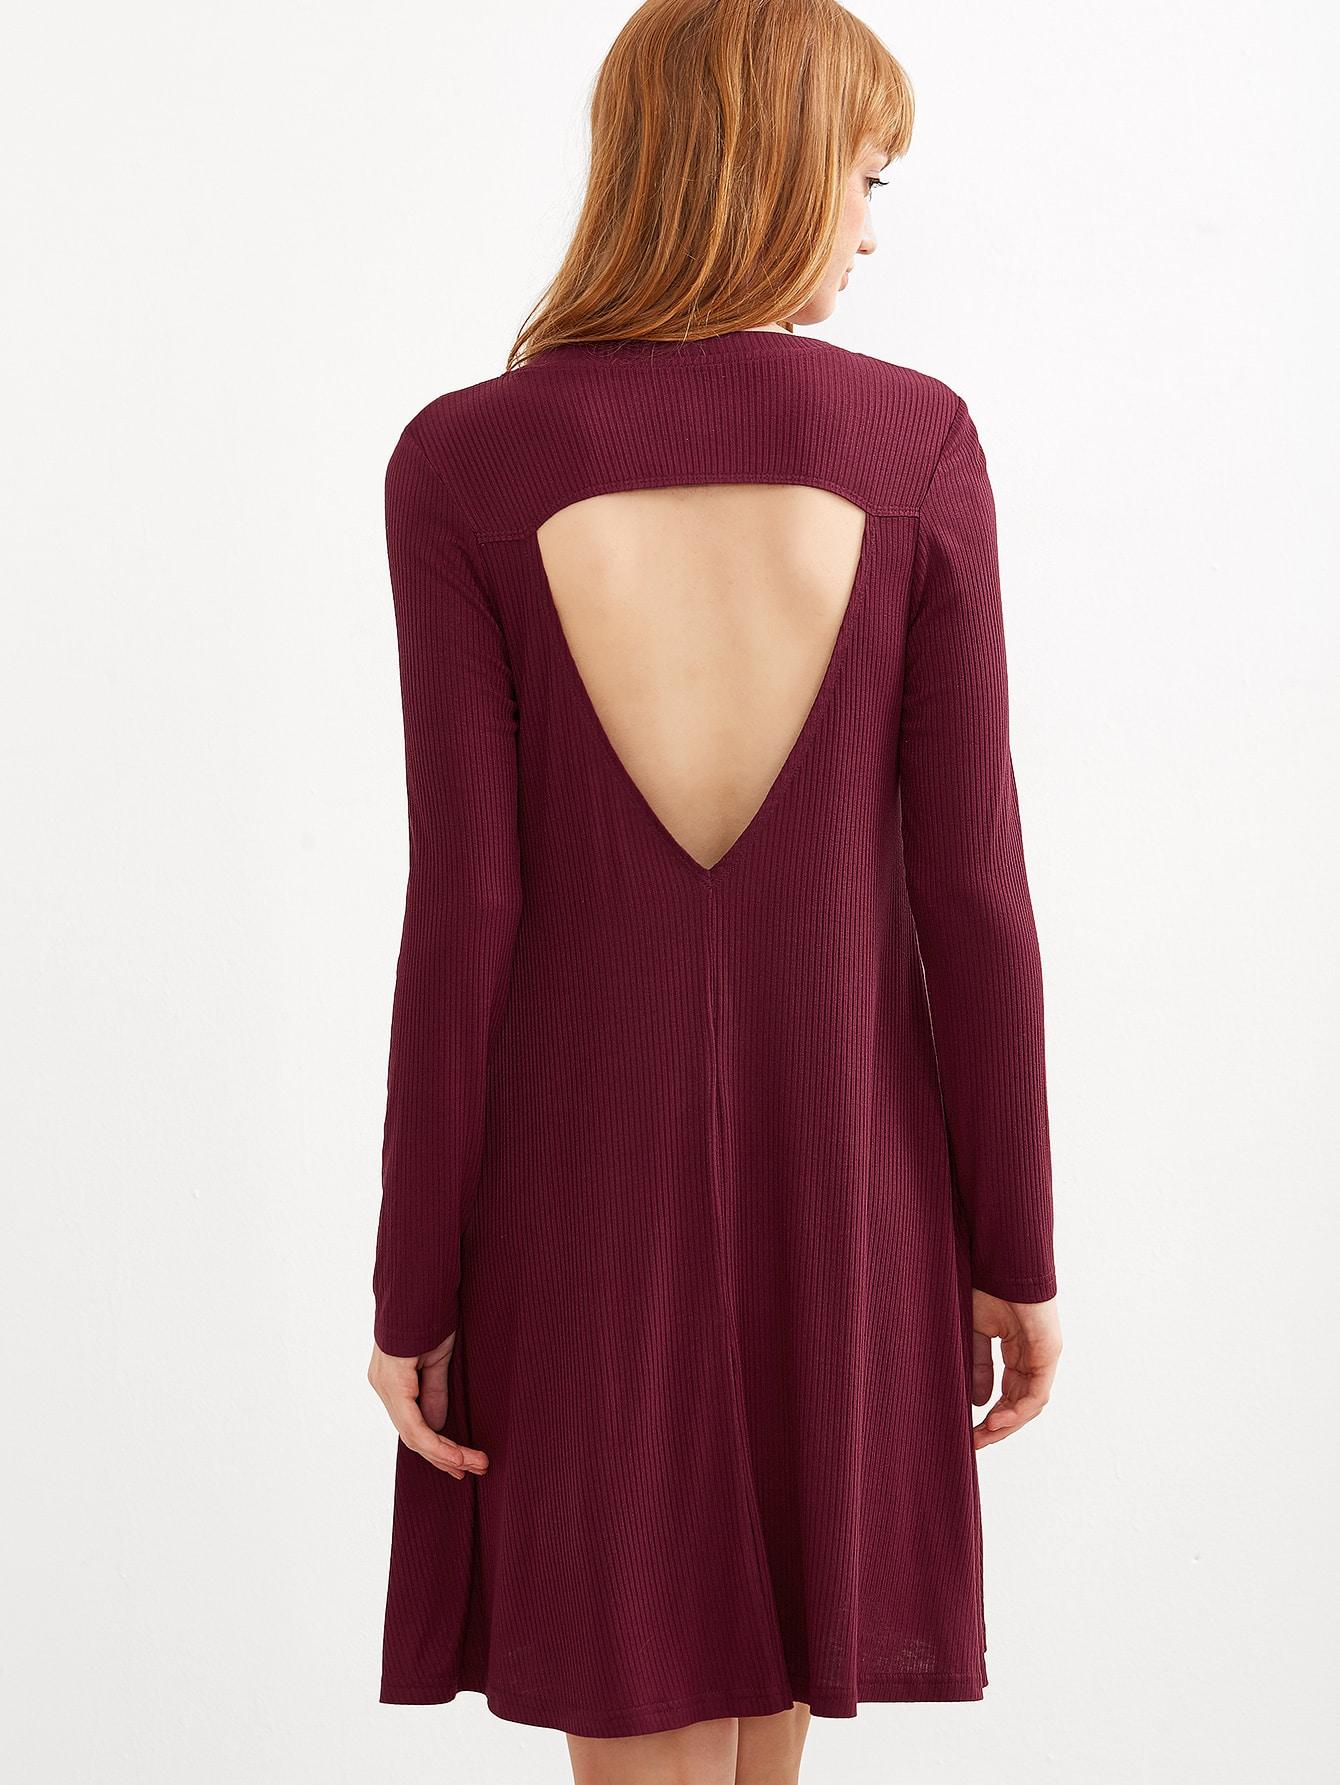 Burgundy Open Back Ribbed Swing Dress dress160913701